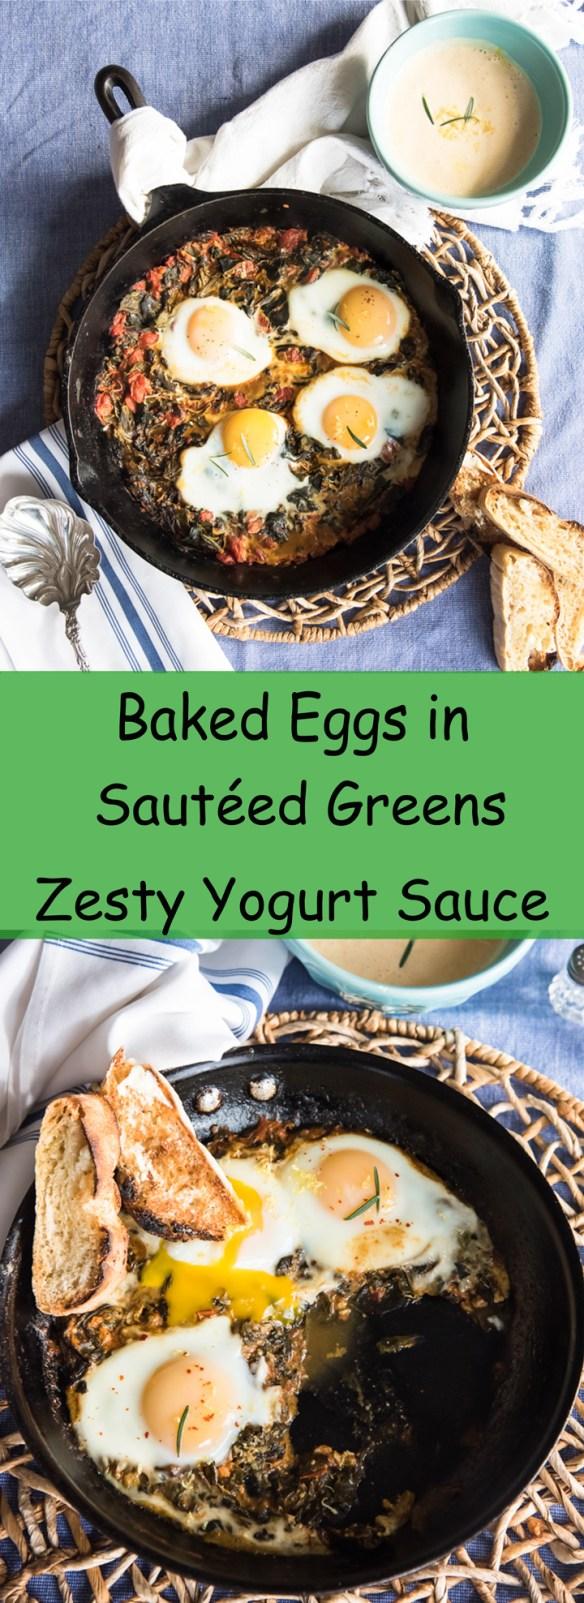 Baked Eggs in Sautéed Greens with a Zesty Yogurt Sauce Recipe. A healty brunch or light supper recipe.